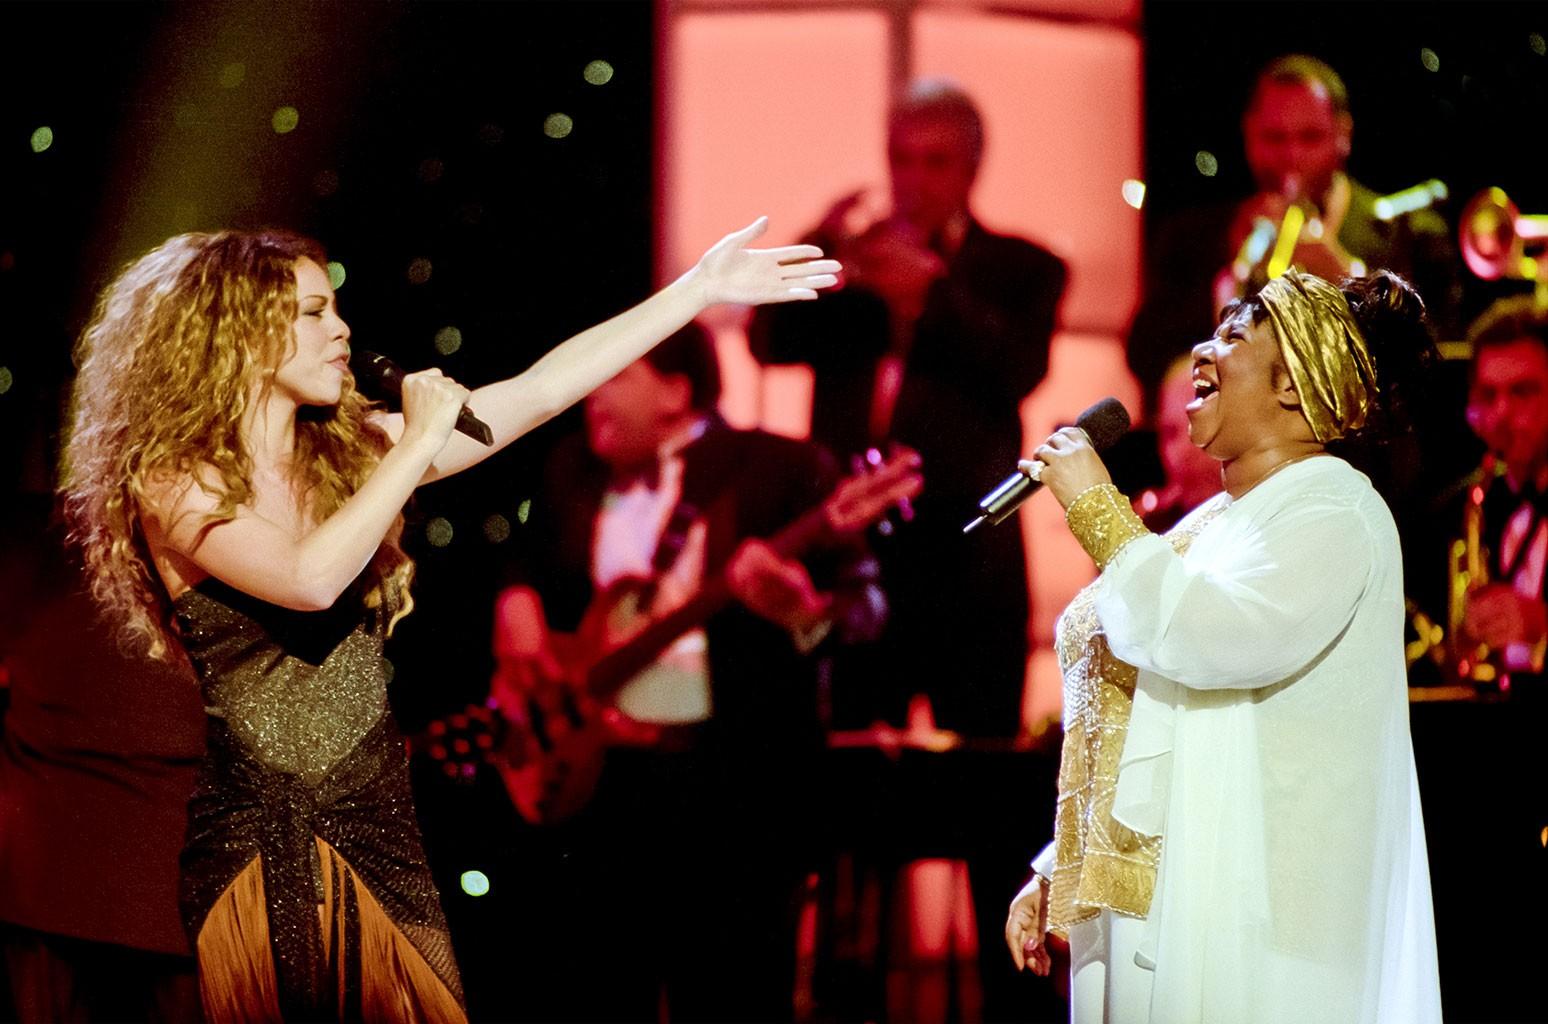 Mariah Carey Recalls 'Divas Live' Performance With Aretha Franklin |  Billboard